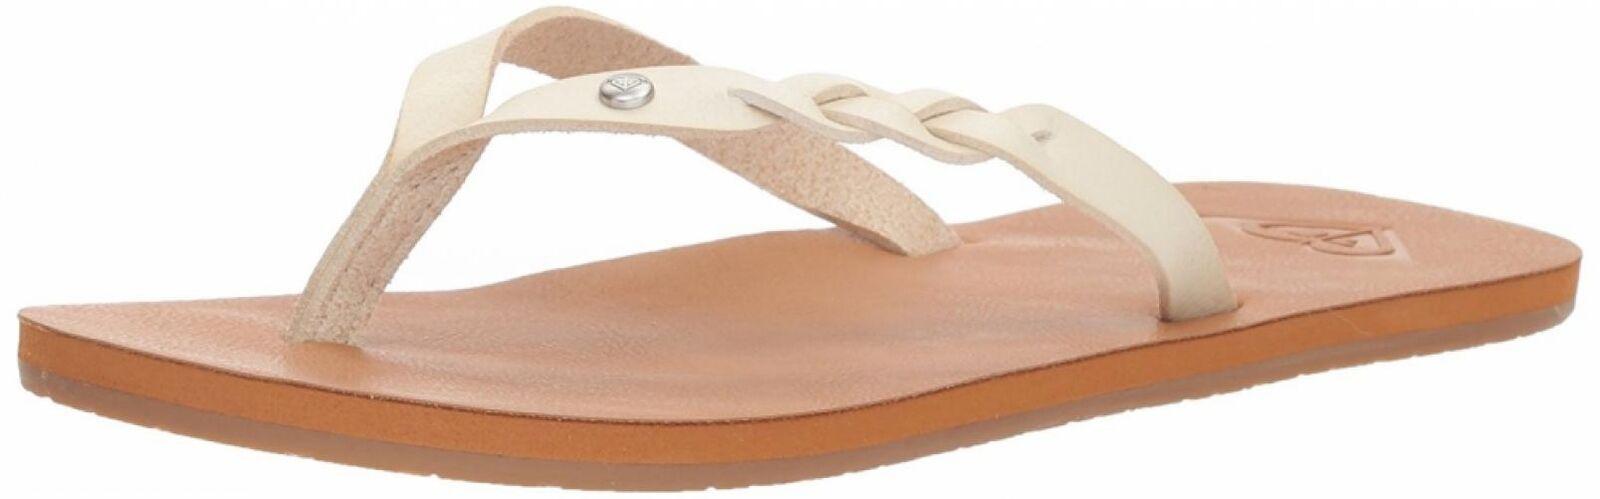 Roxy Mujer liza Flip-Flop Sandal Sandal Sandal  calidad fantástica